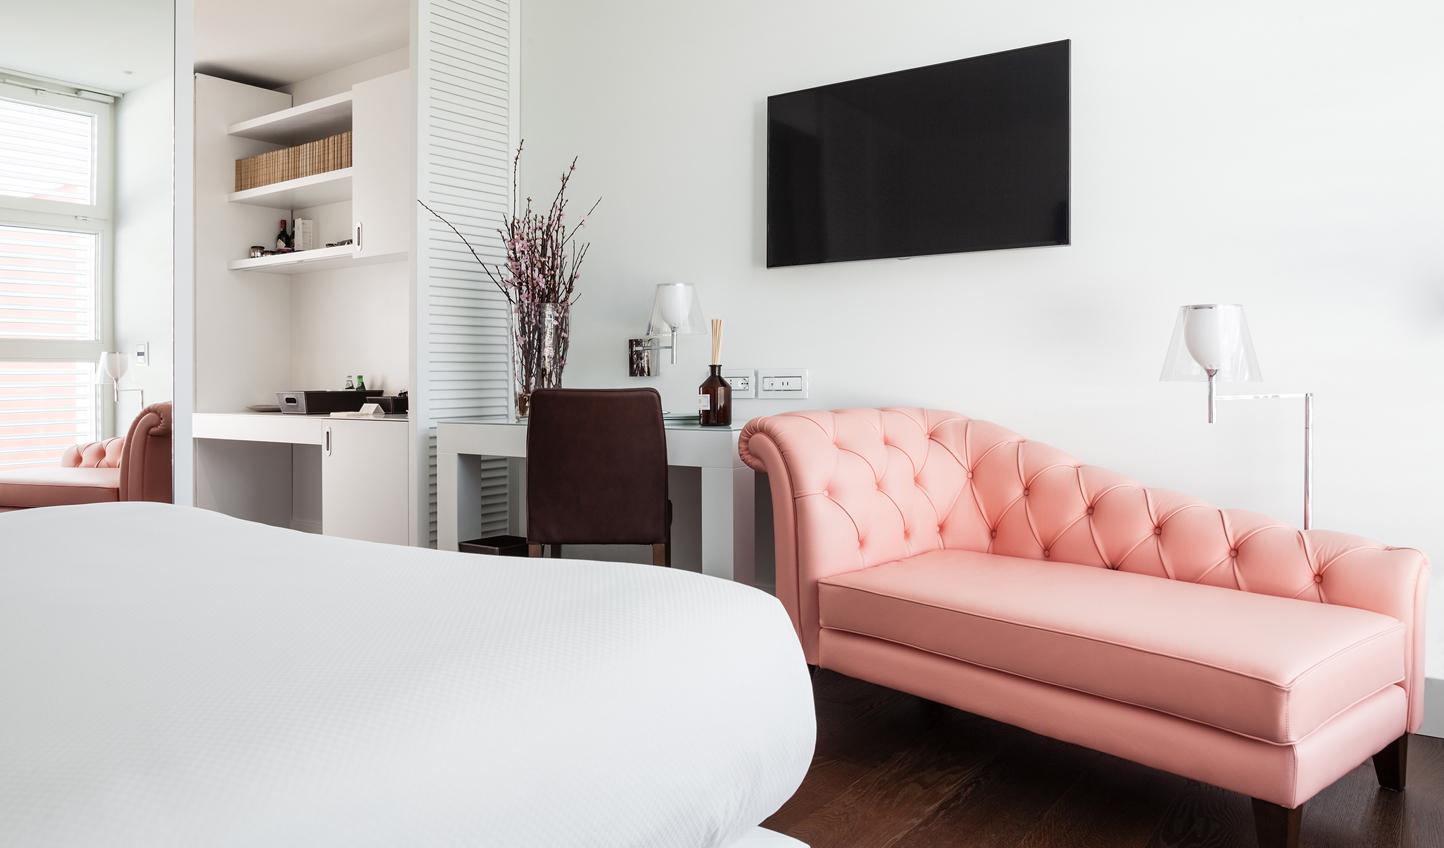 Minimalist suites with splashes of colour